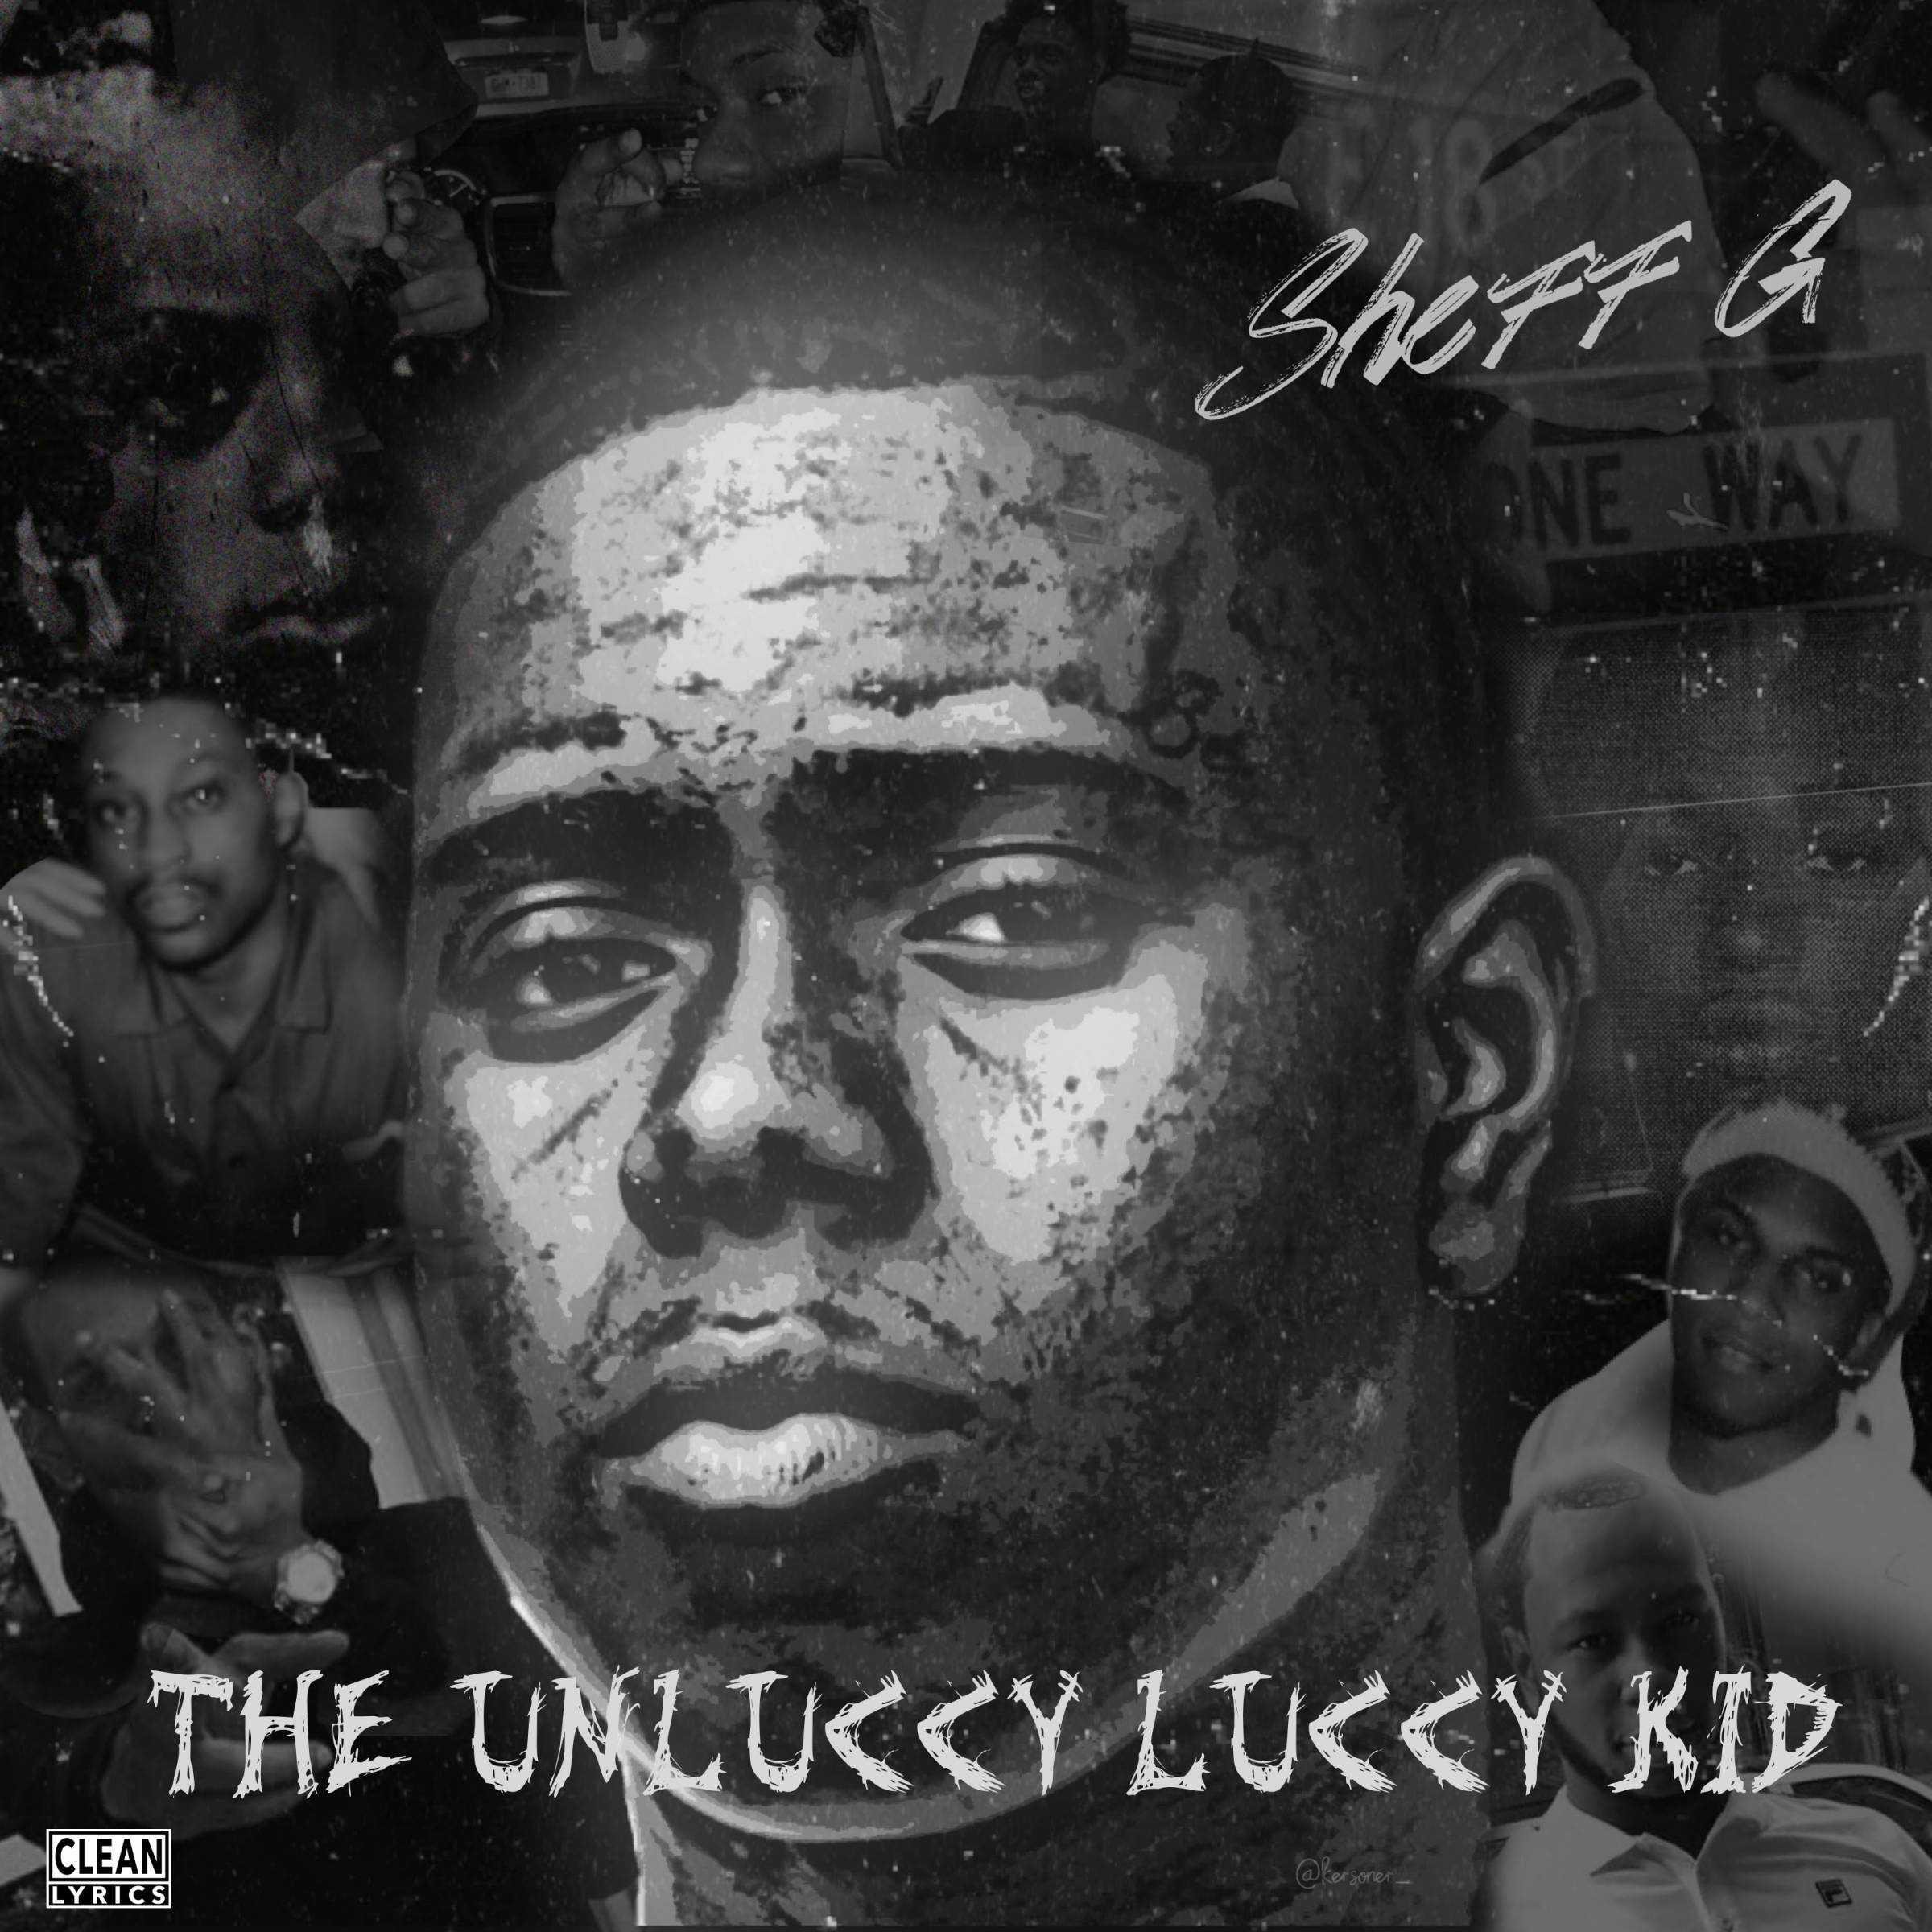 Album Stream: Sheff G – THE UNLUCCY LUCCY KID [Audio]